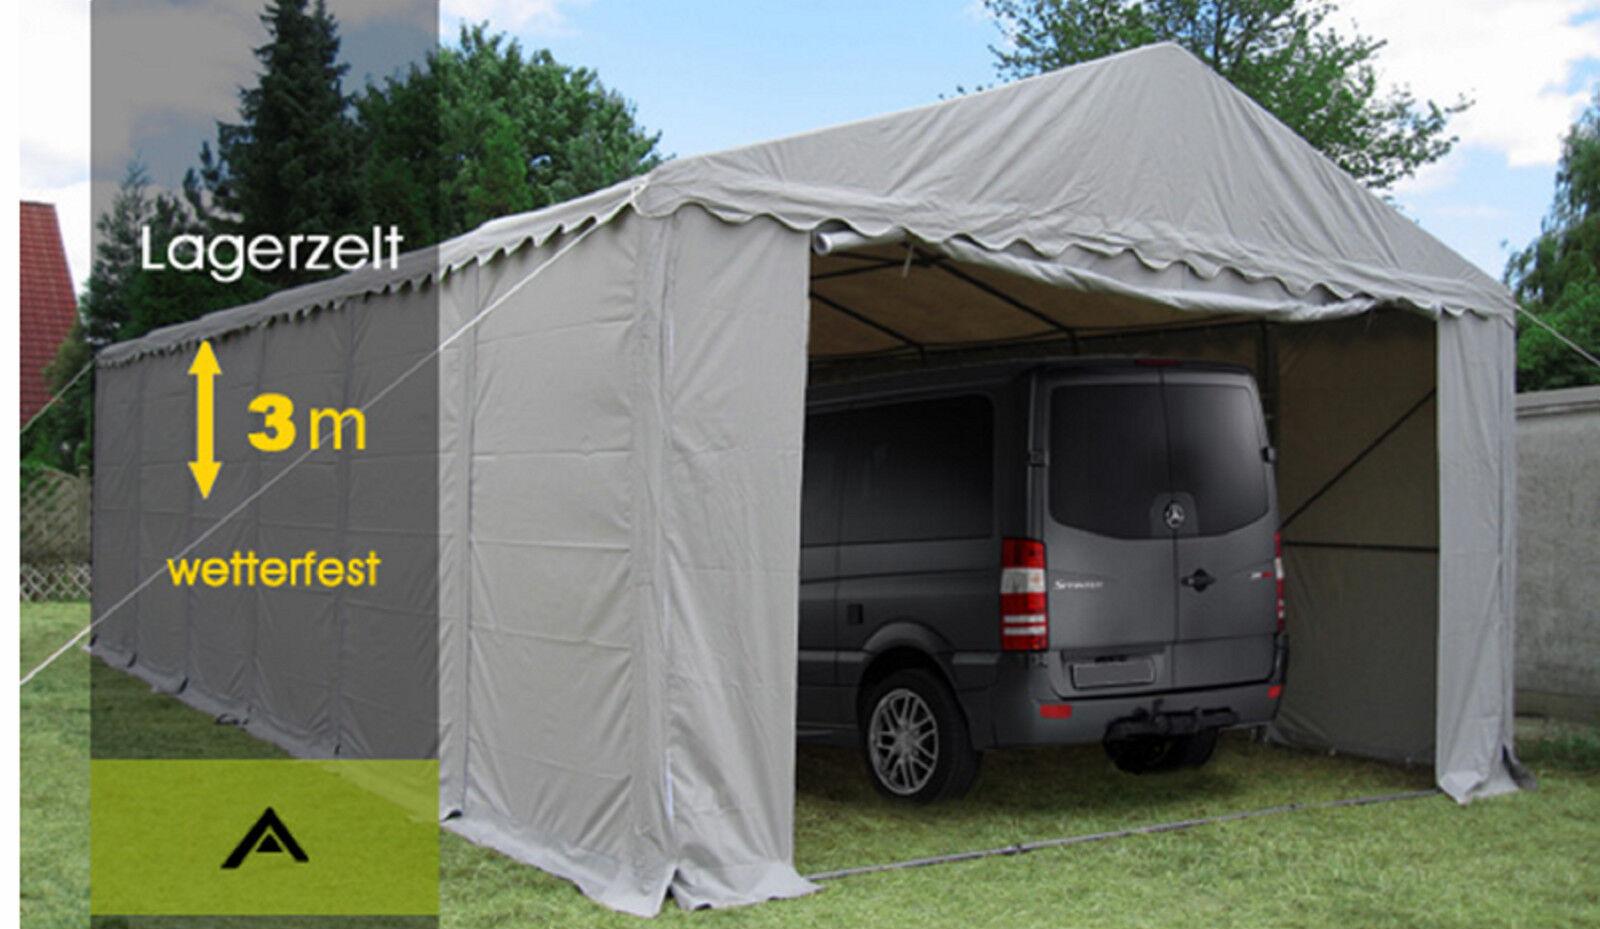 3x6 3x6 3x6 - 6x12m PVC mobiles Lagerzelt Zelt Unterstand Weidezelt Festzelt Lager NEU   Spezielle Funktion    Grüne, neue Technologie    Ausgewählte Materialien  c3f02b